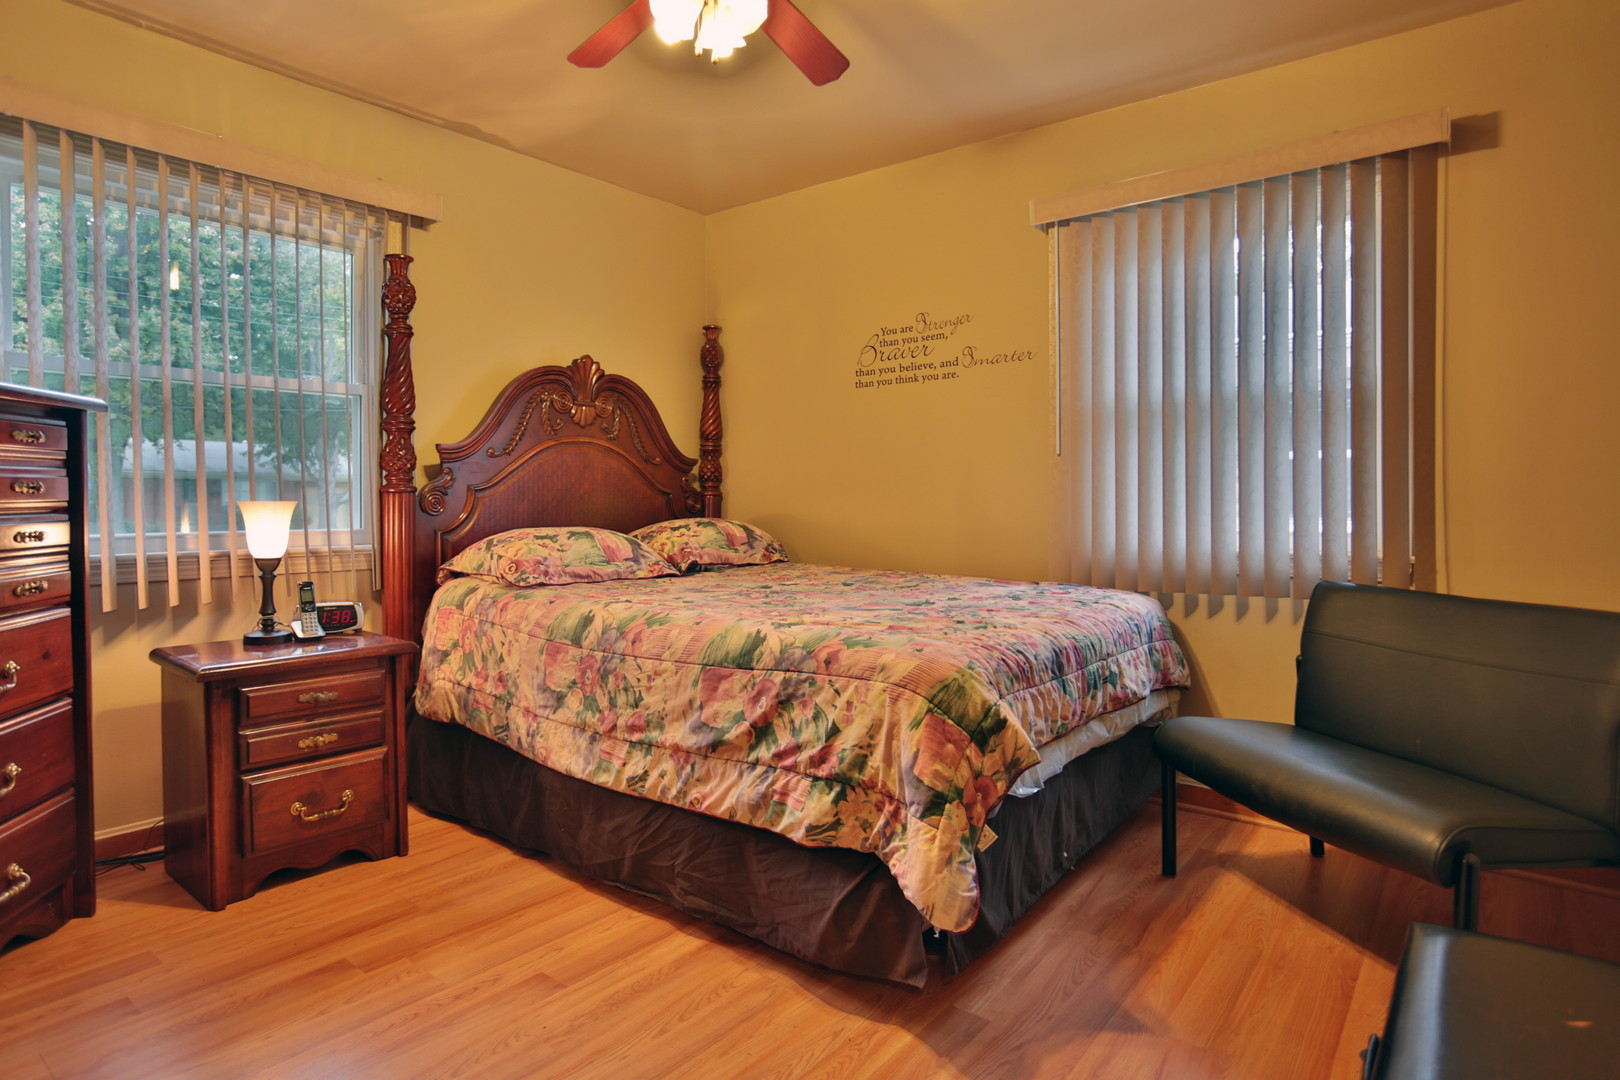 4033 Addison Lane Louisville, KY 40216 Bedroom